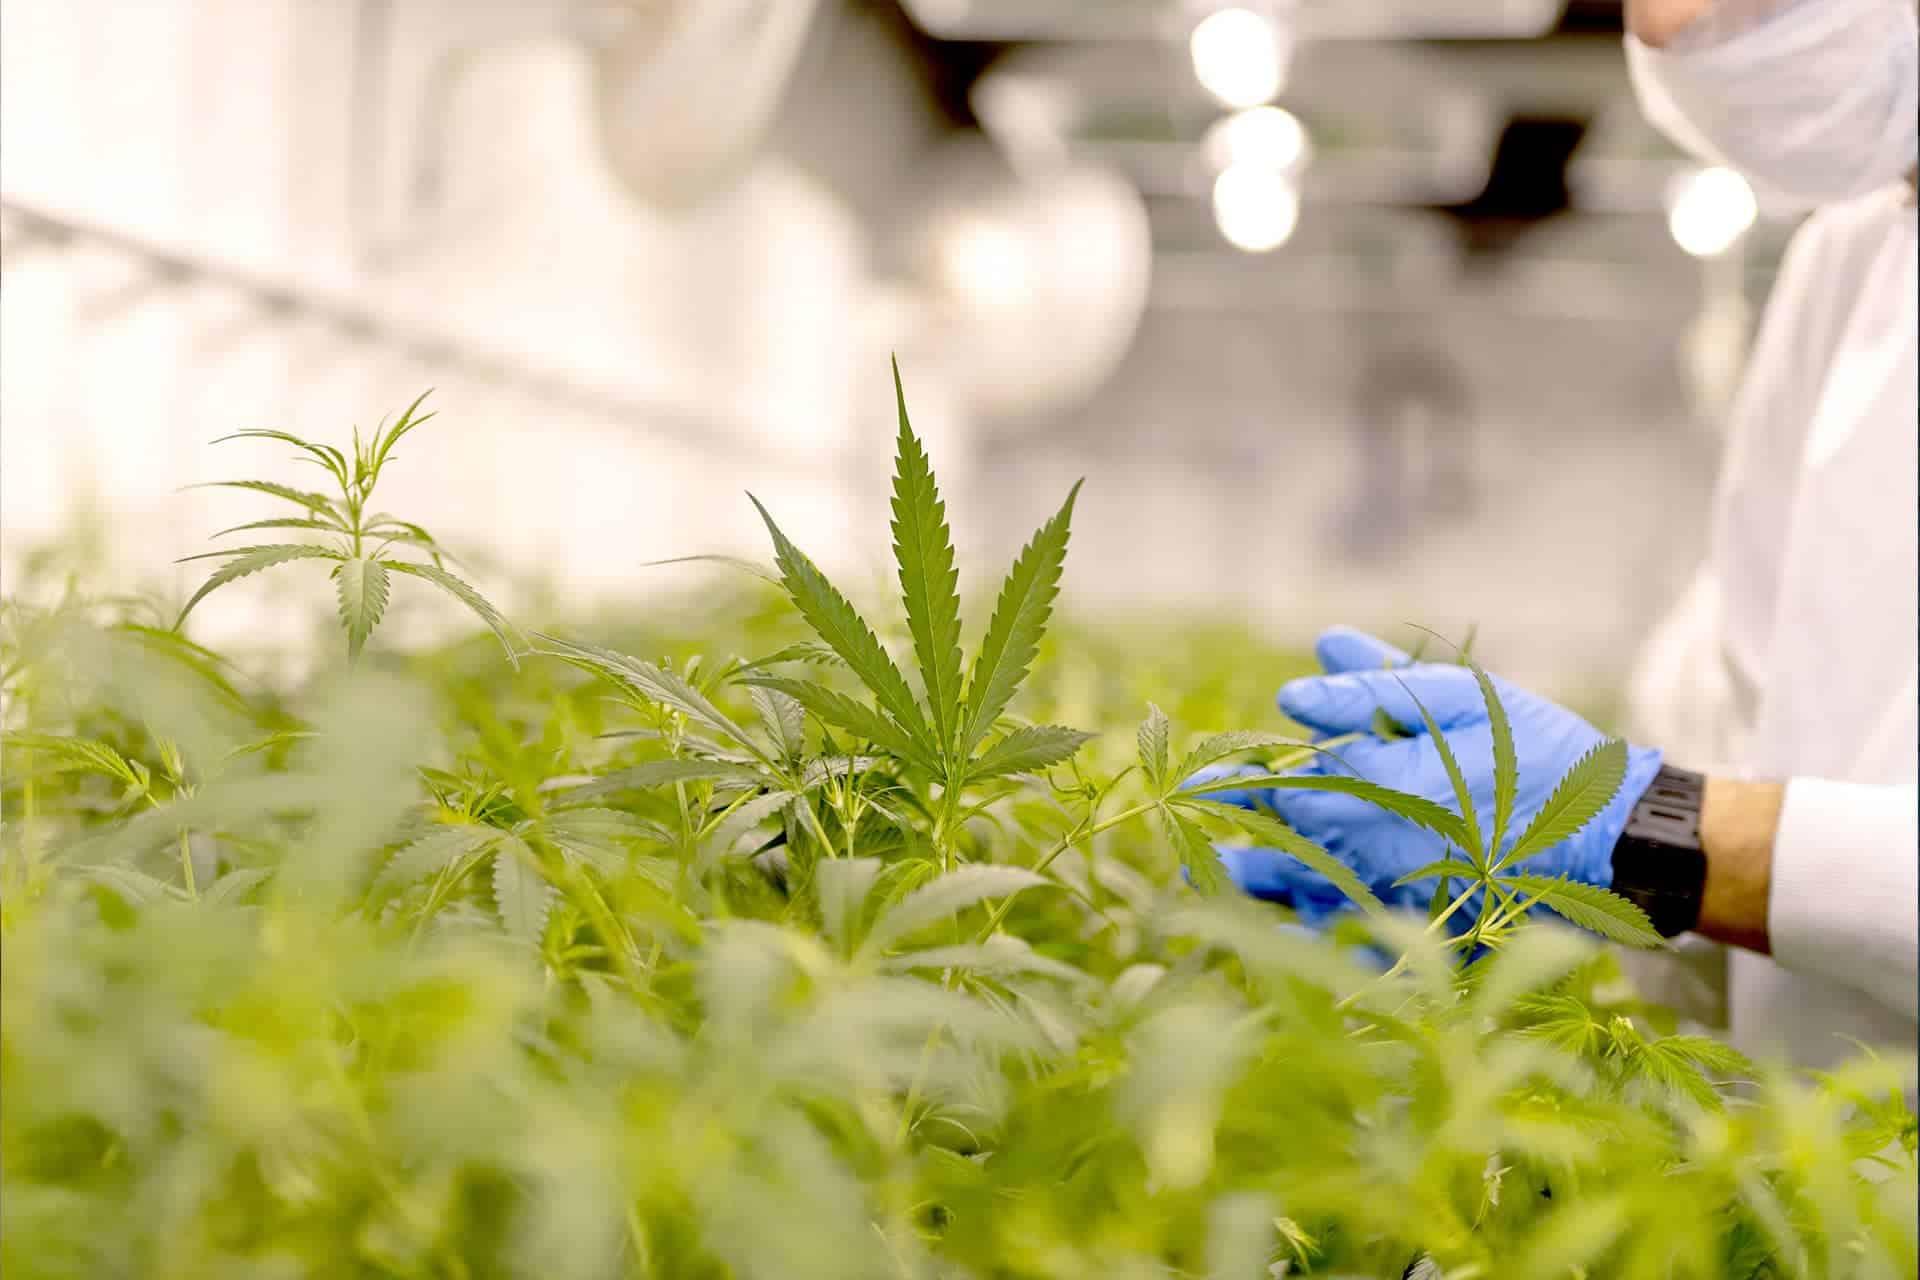 Ora Pharm secures Medicinal Cannabis License